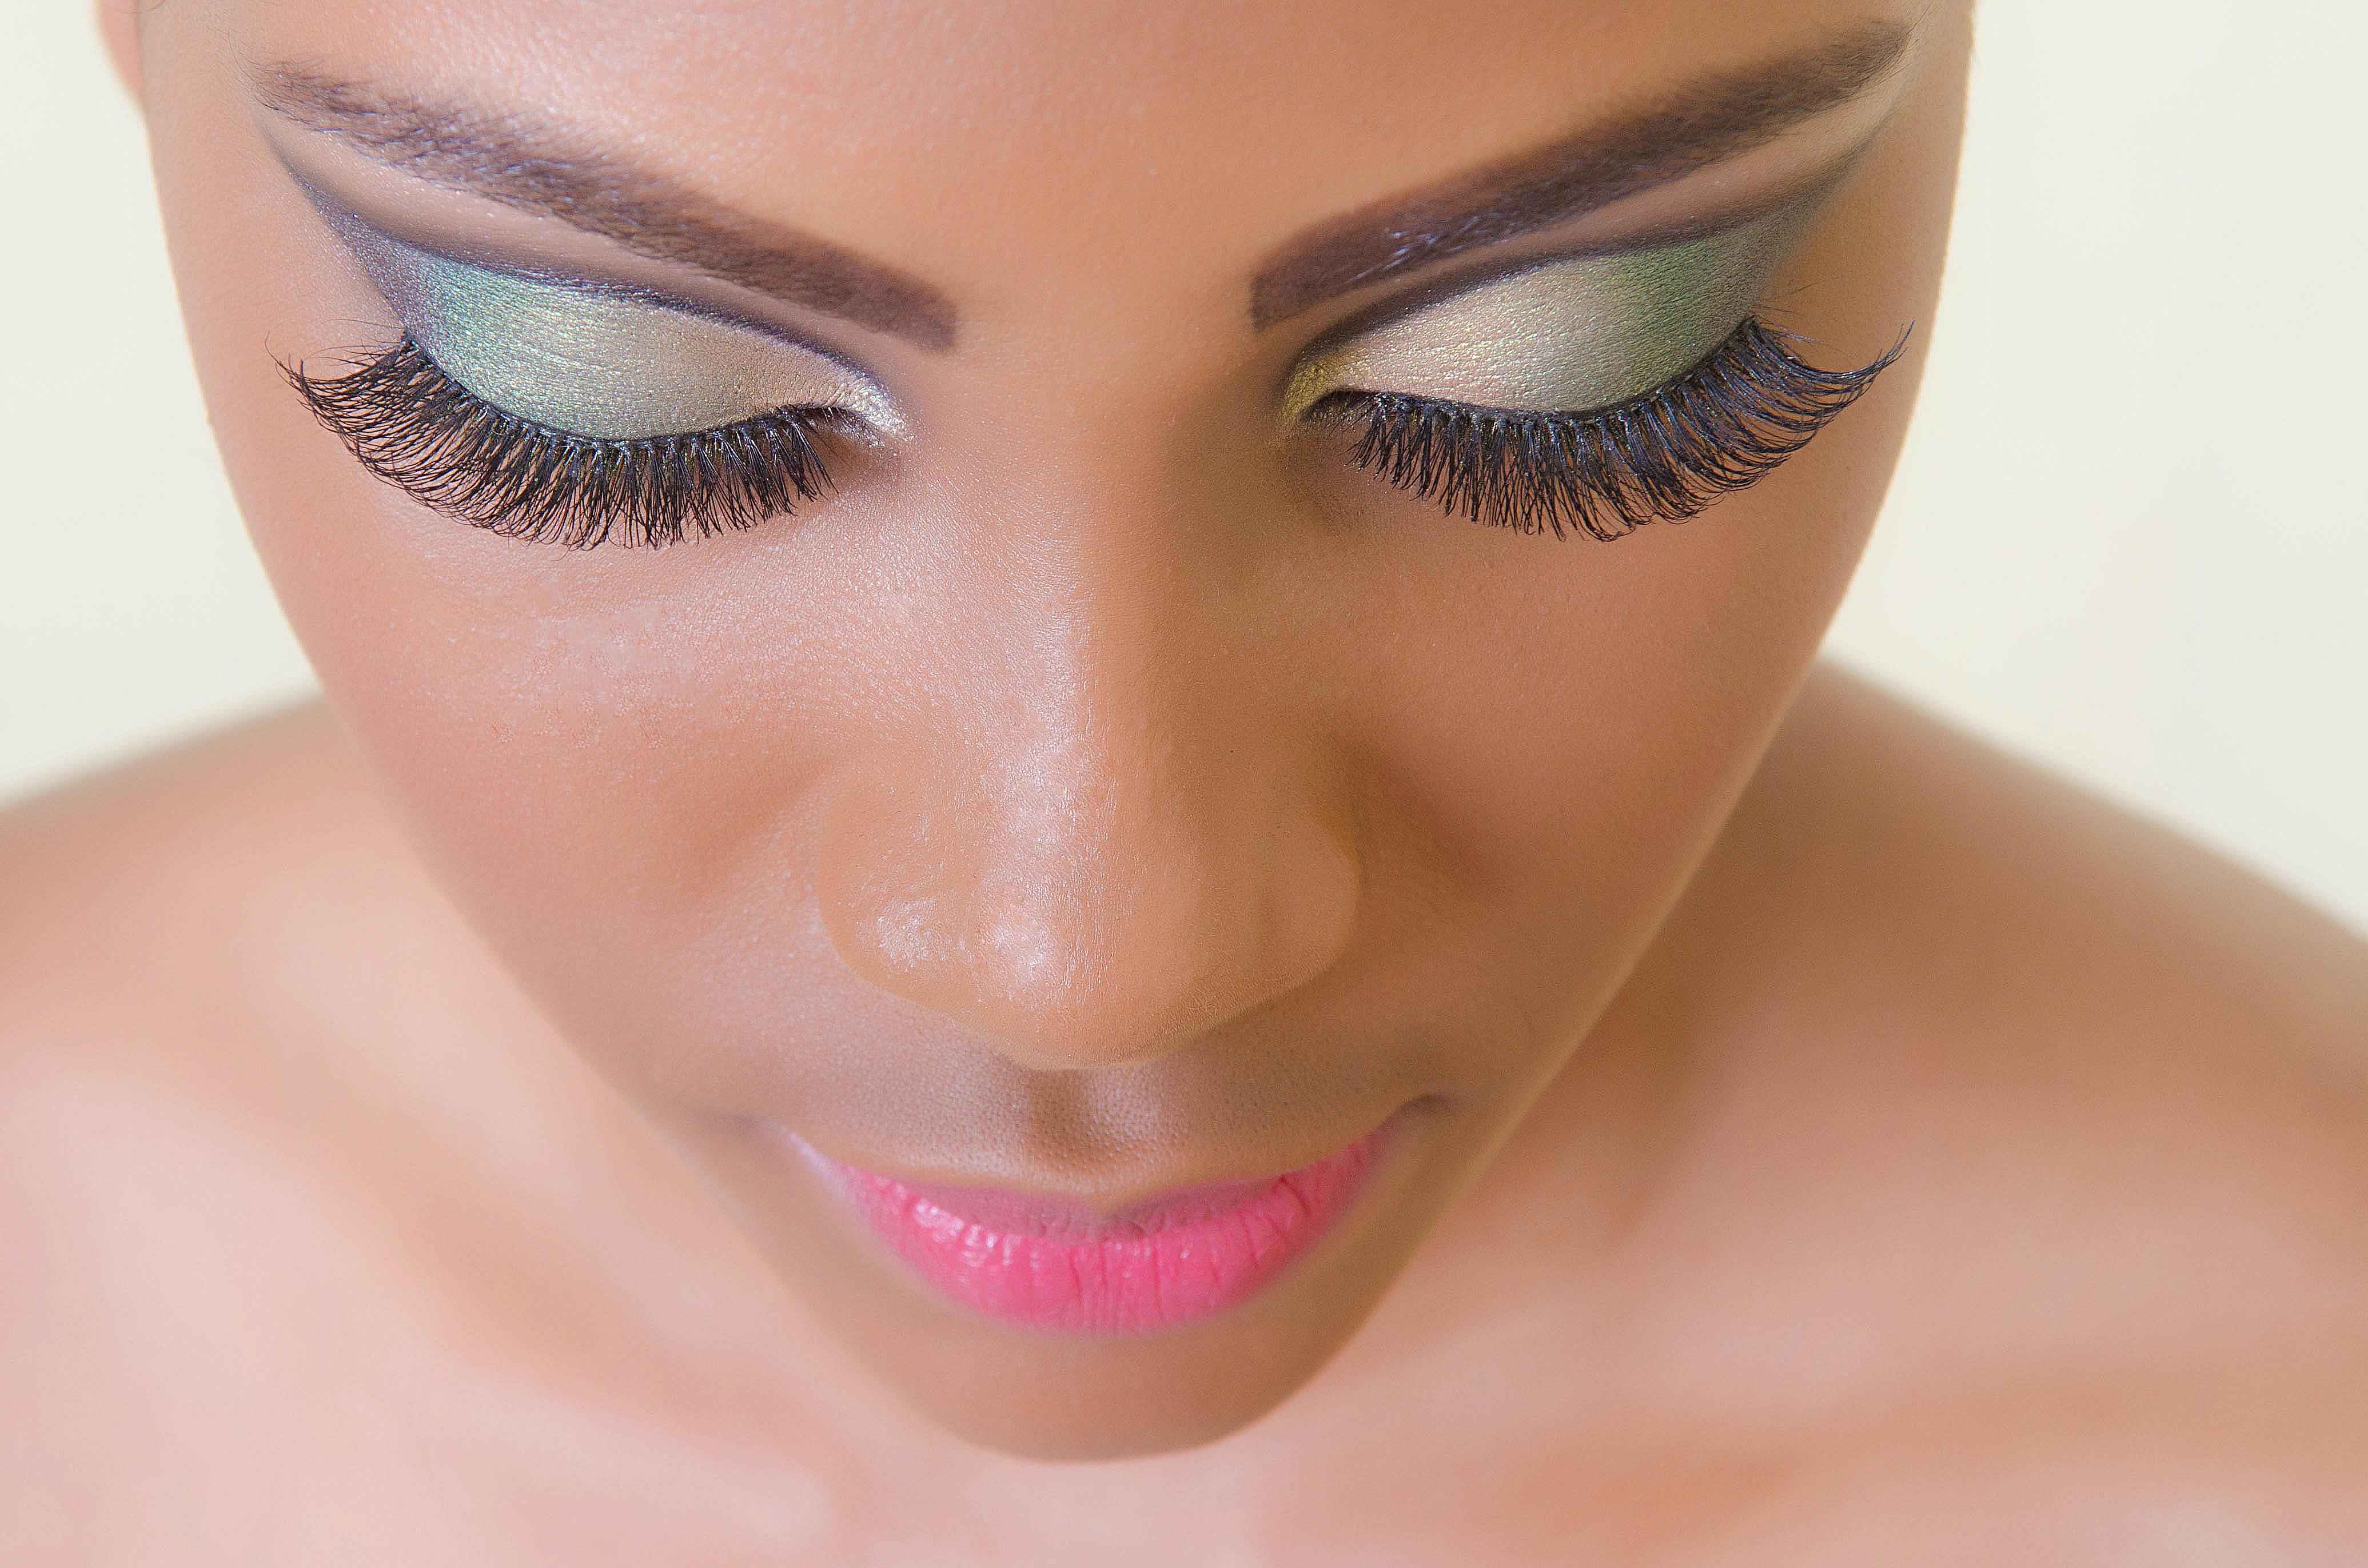 maquiagem colorida maquiagem  maquiador(a)